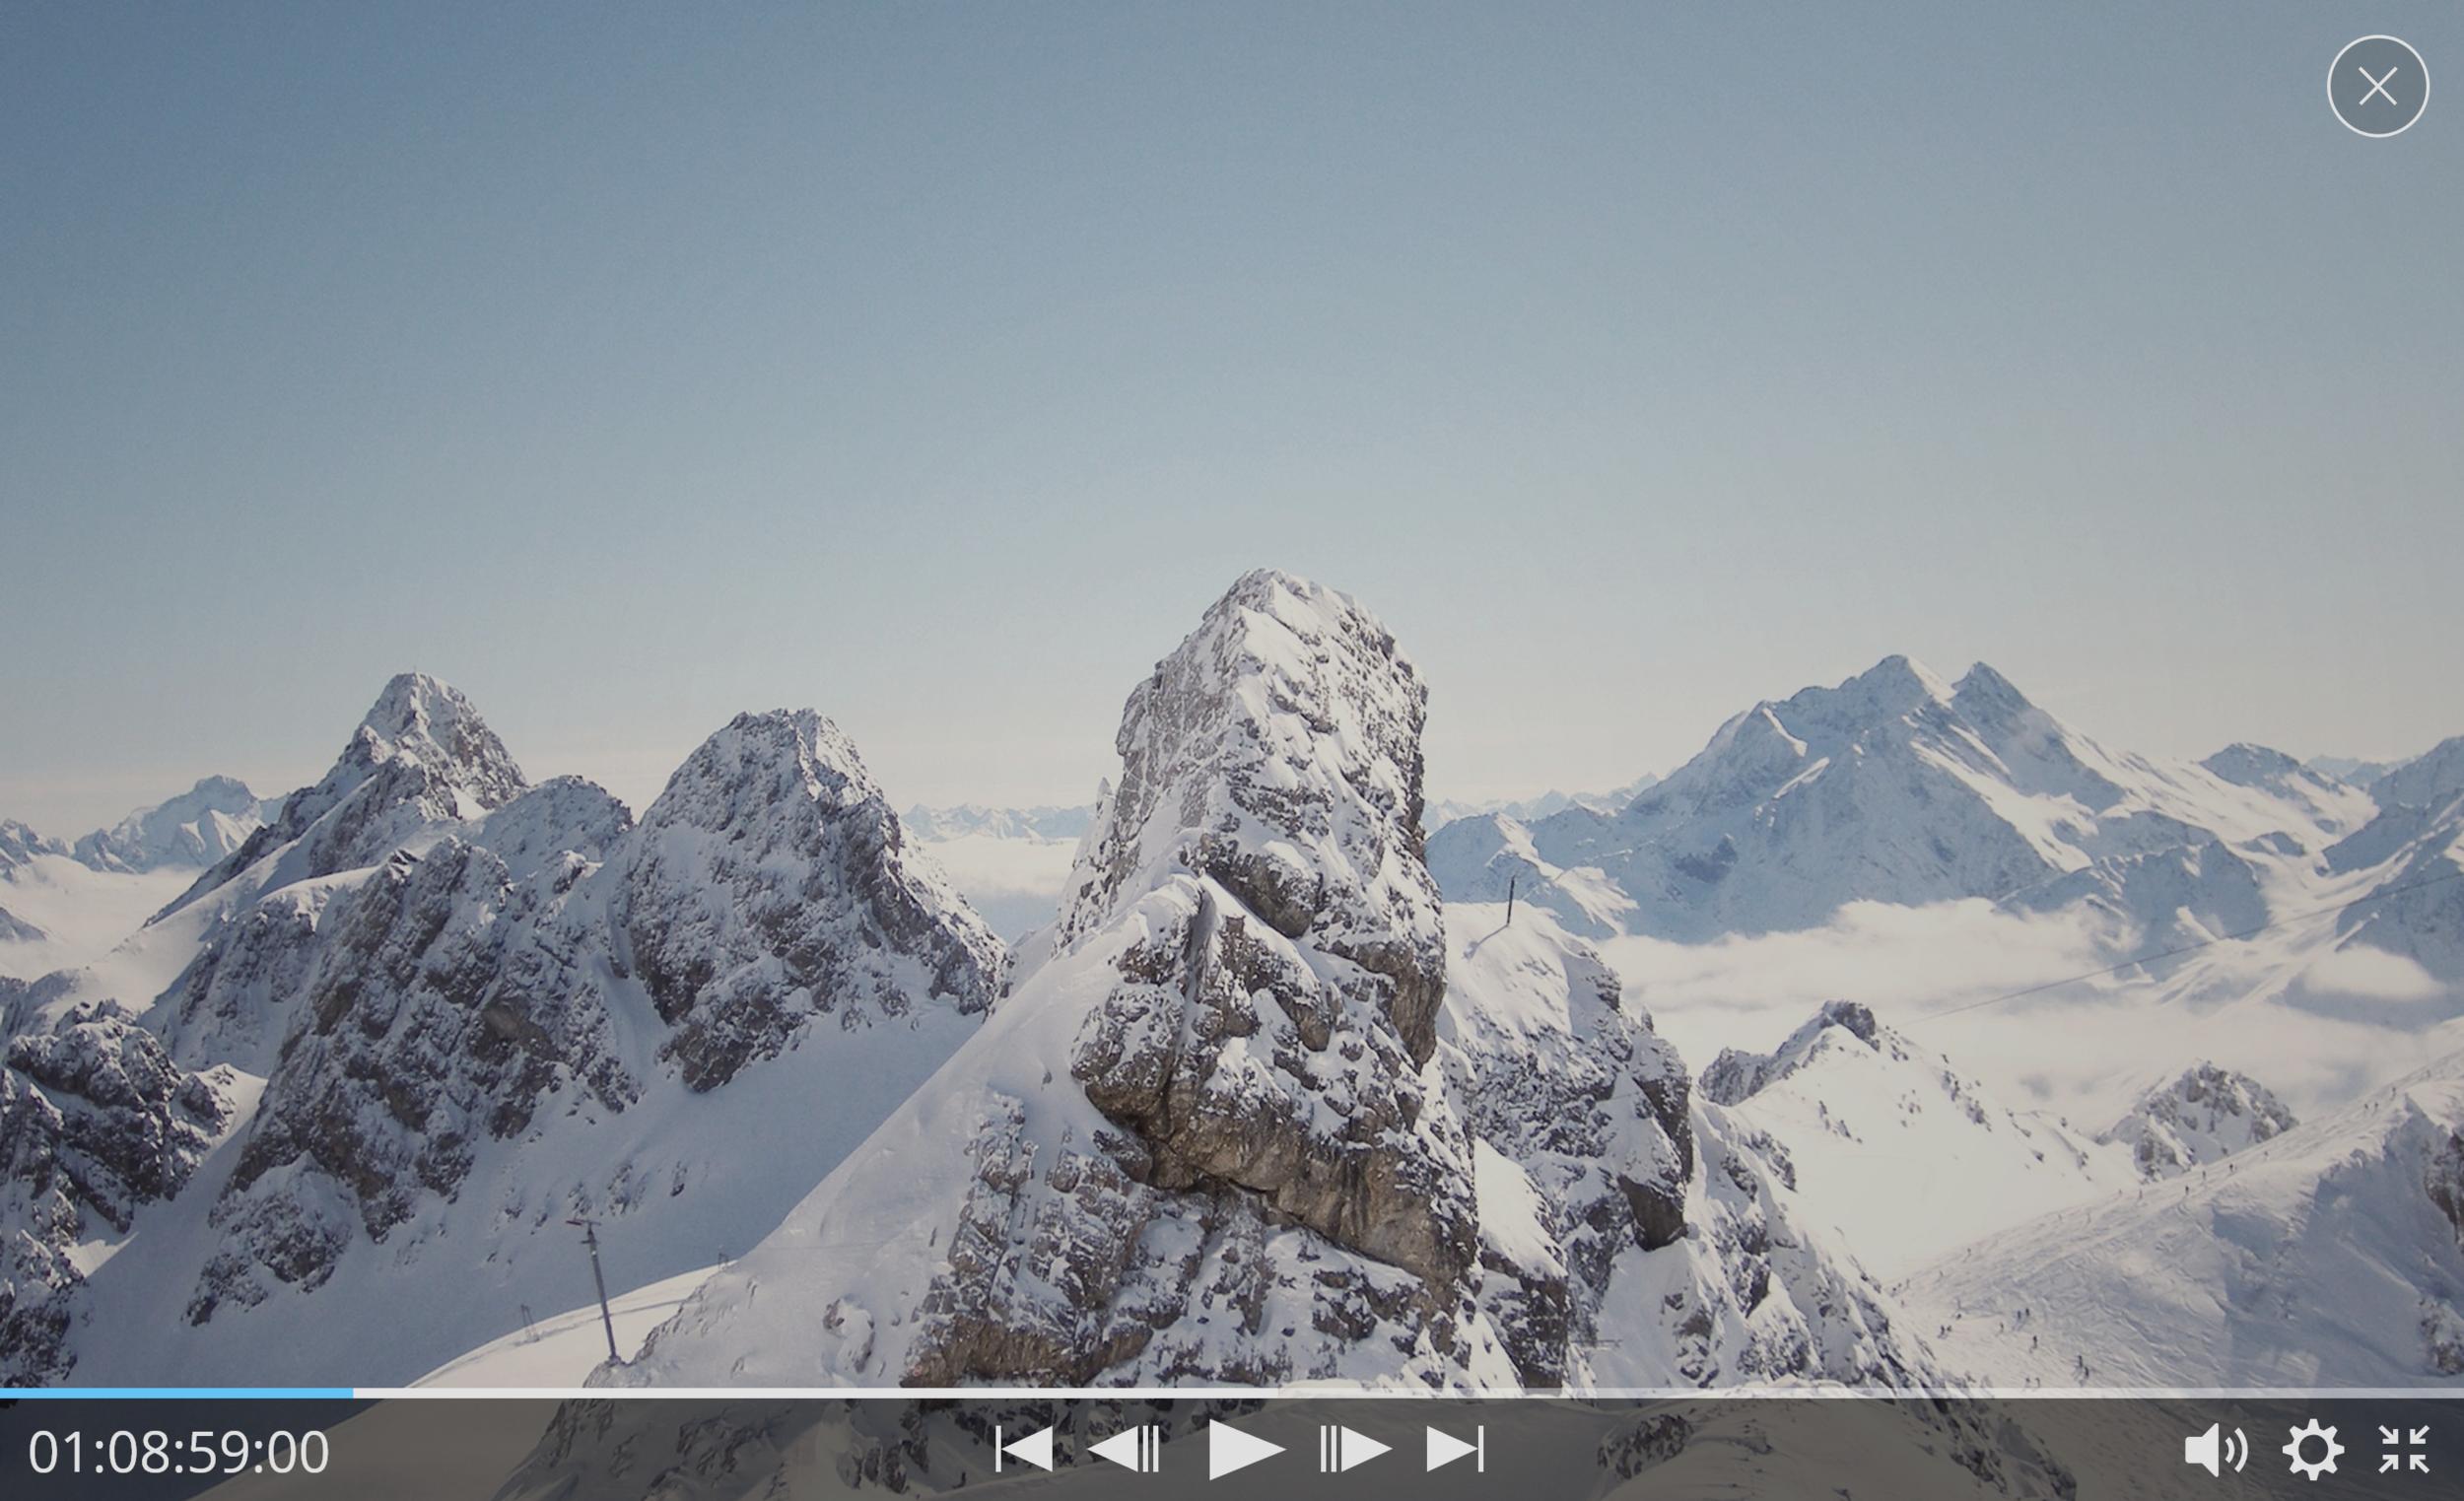 XDCAM Air – Fullscreen@2x.png